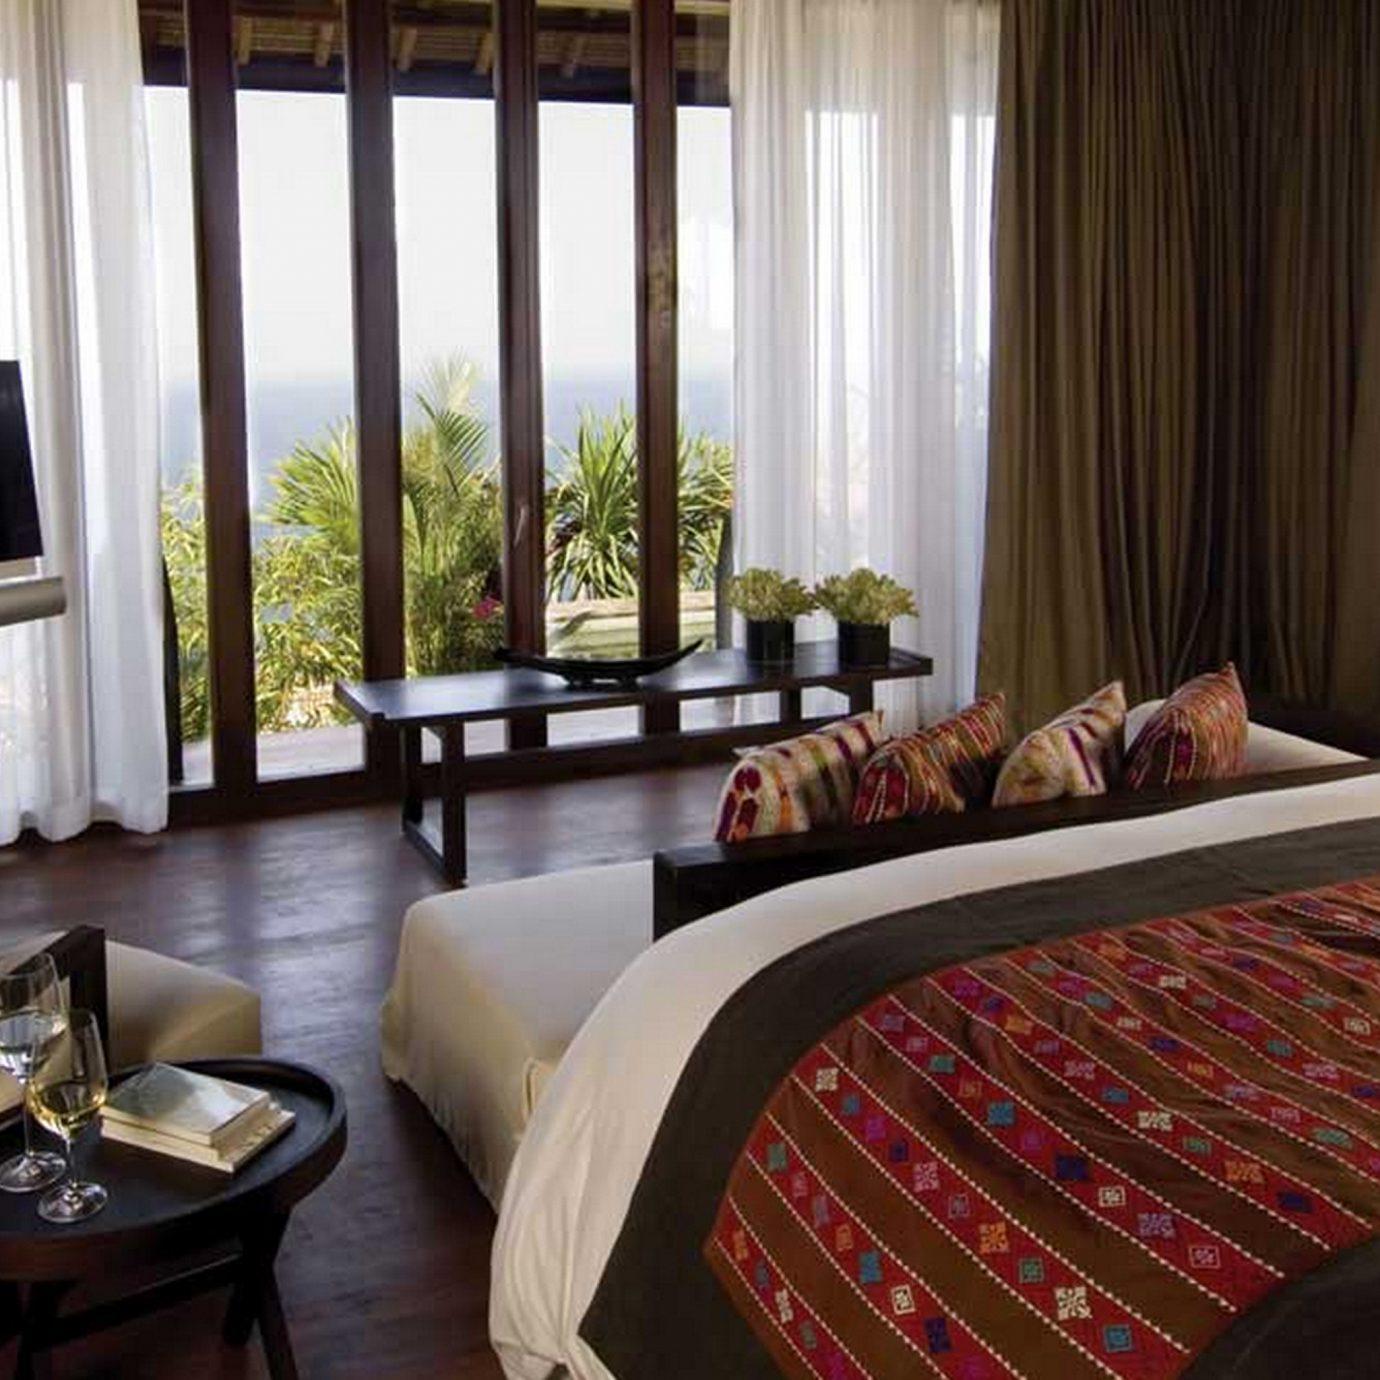 Bedroom Hip Luxury Modern Suite curtain chair property cottage home Resort living room condominium